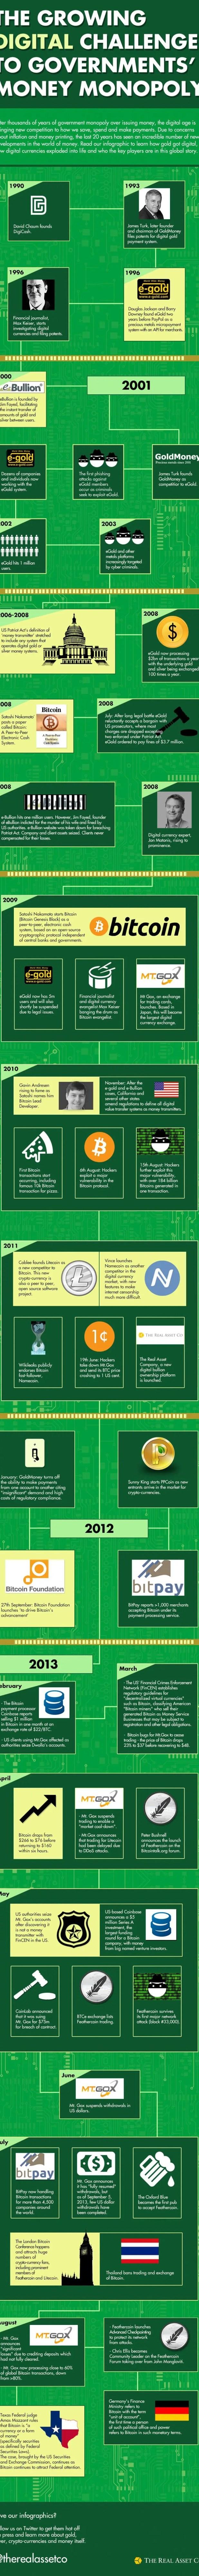 digi-money-infographic